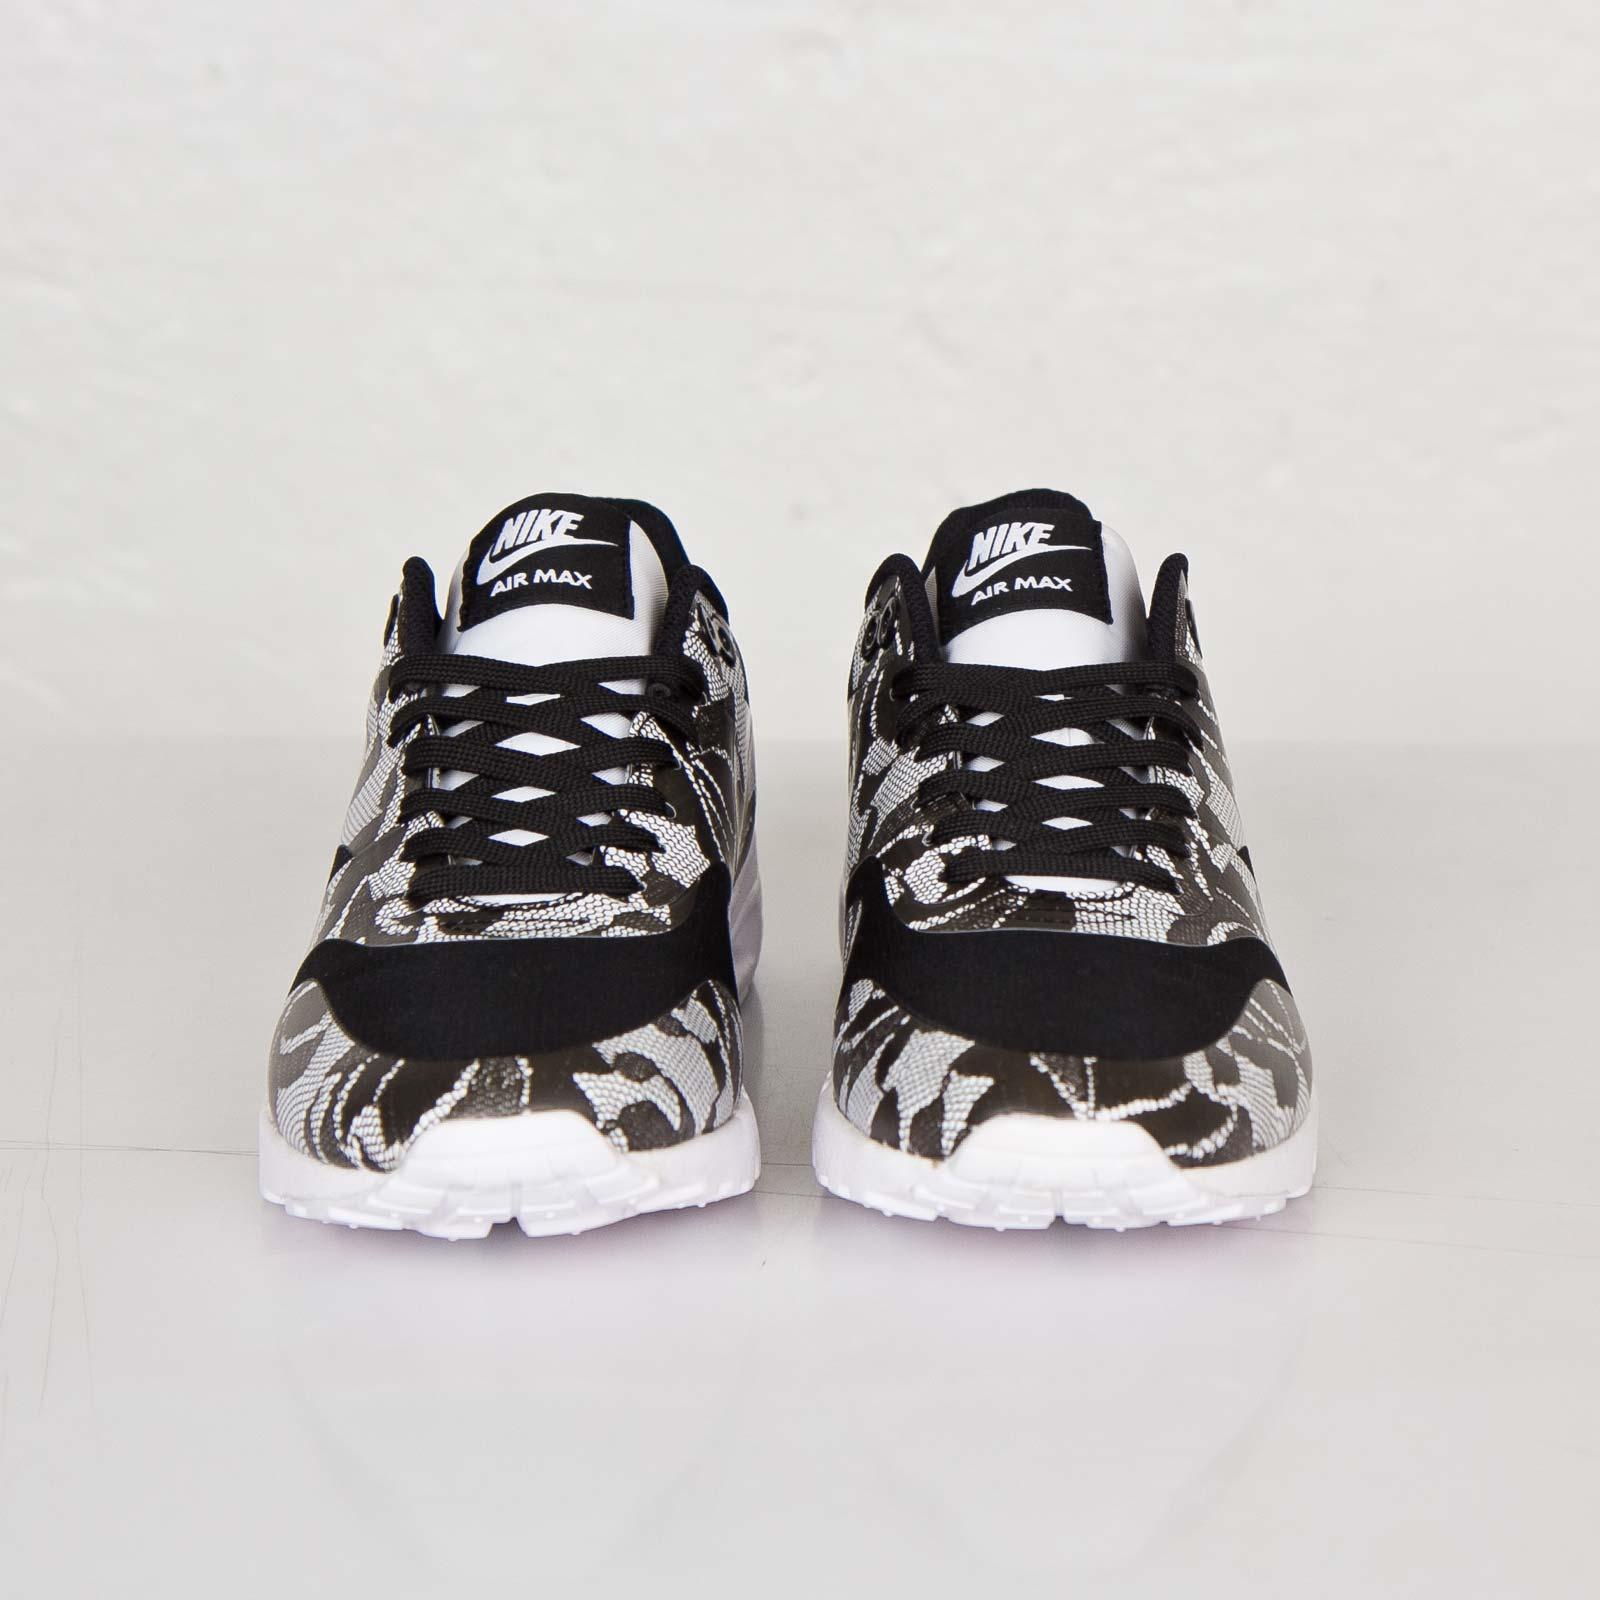 Nike Wmns Air Max 1 Ultra SP 789564 001 Sneakersnstuff